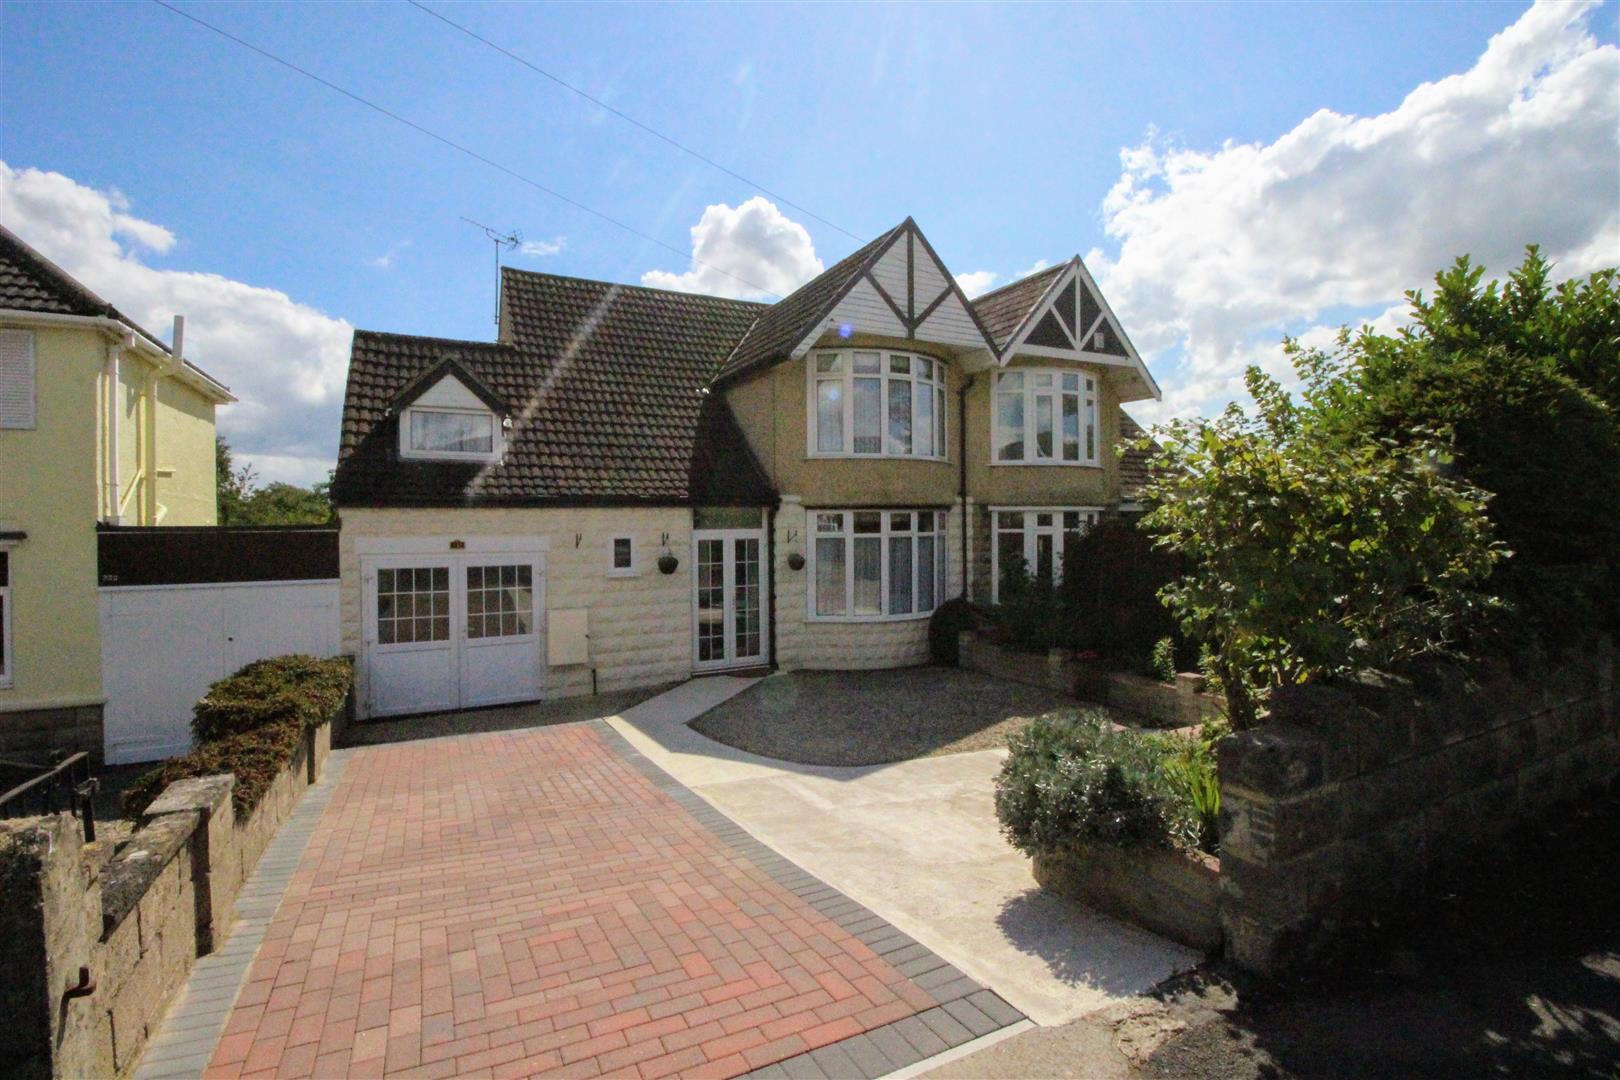 3 Bedrooms Property for sale in Marlborough Road, Swindon